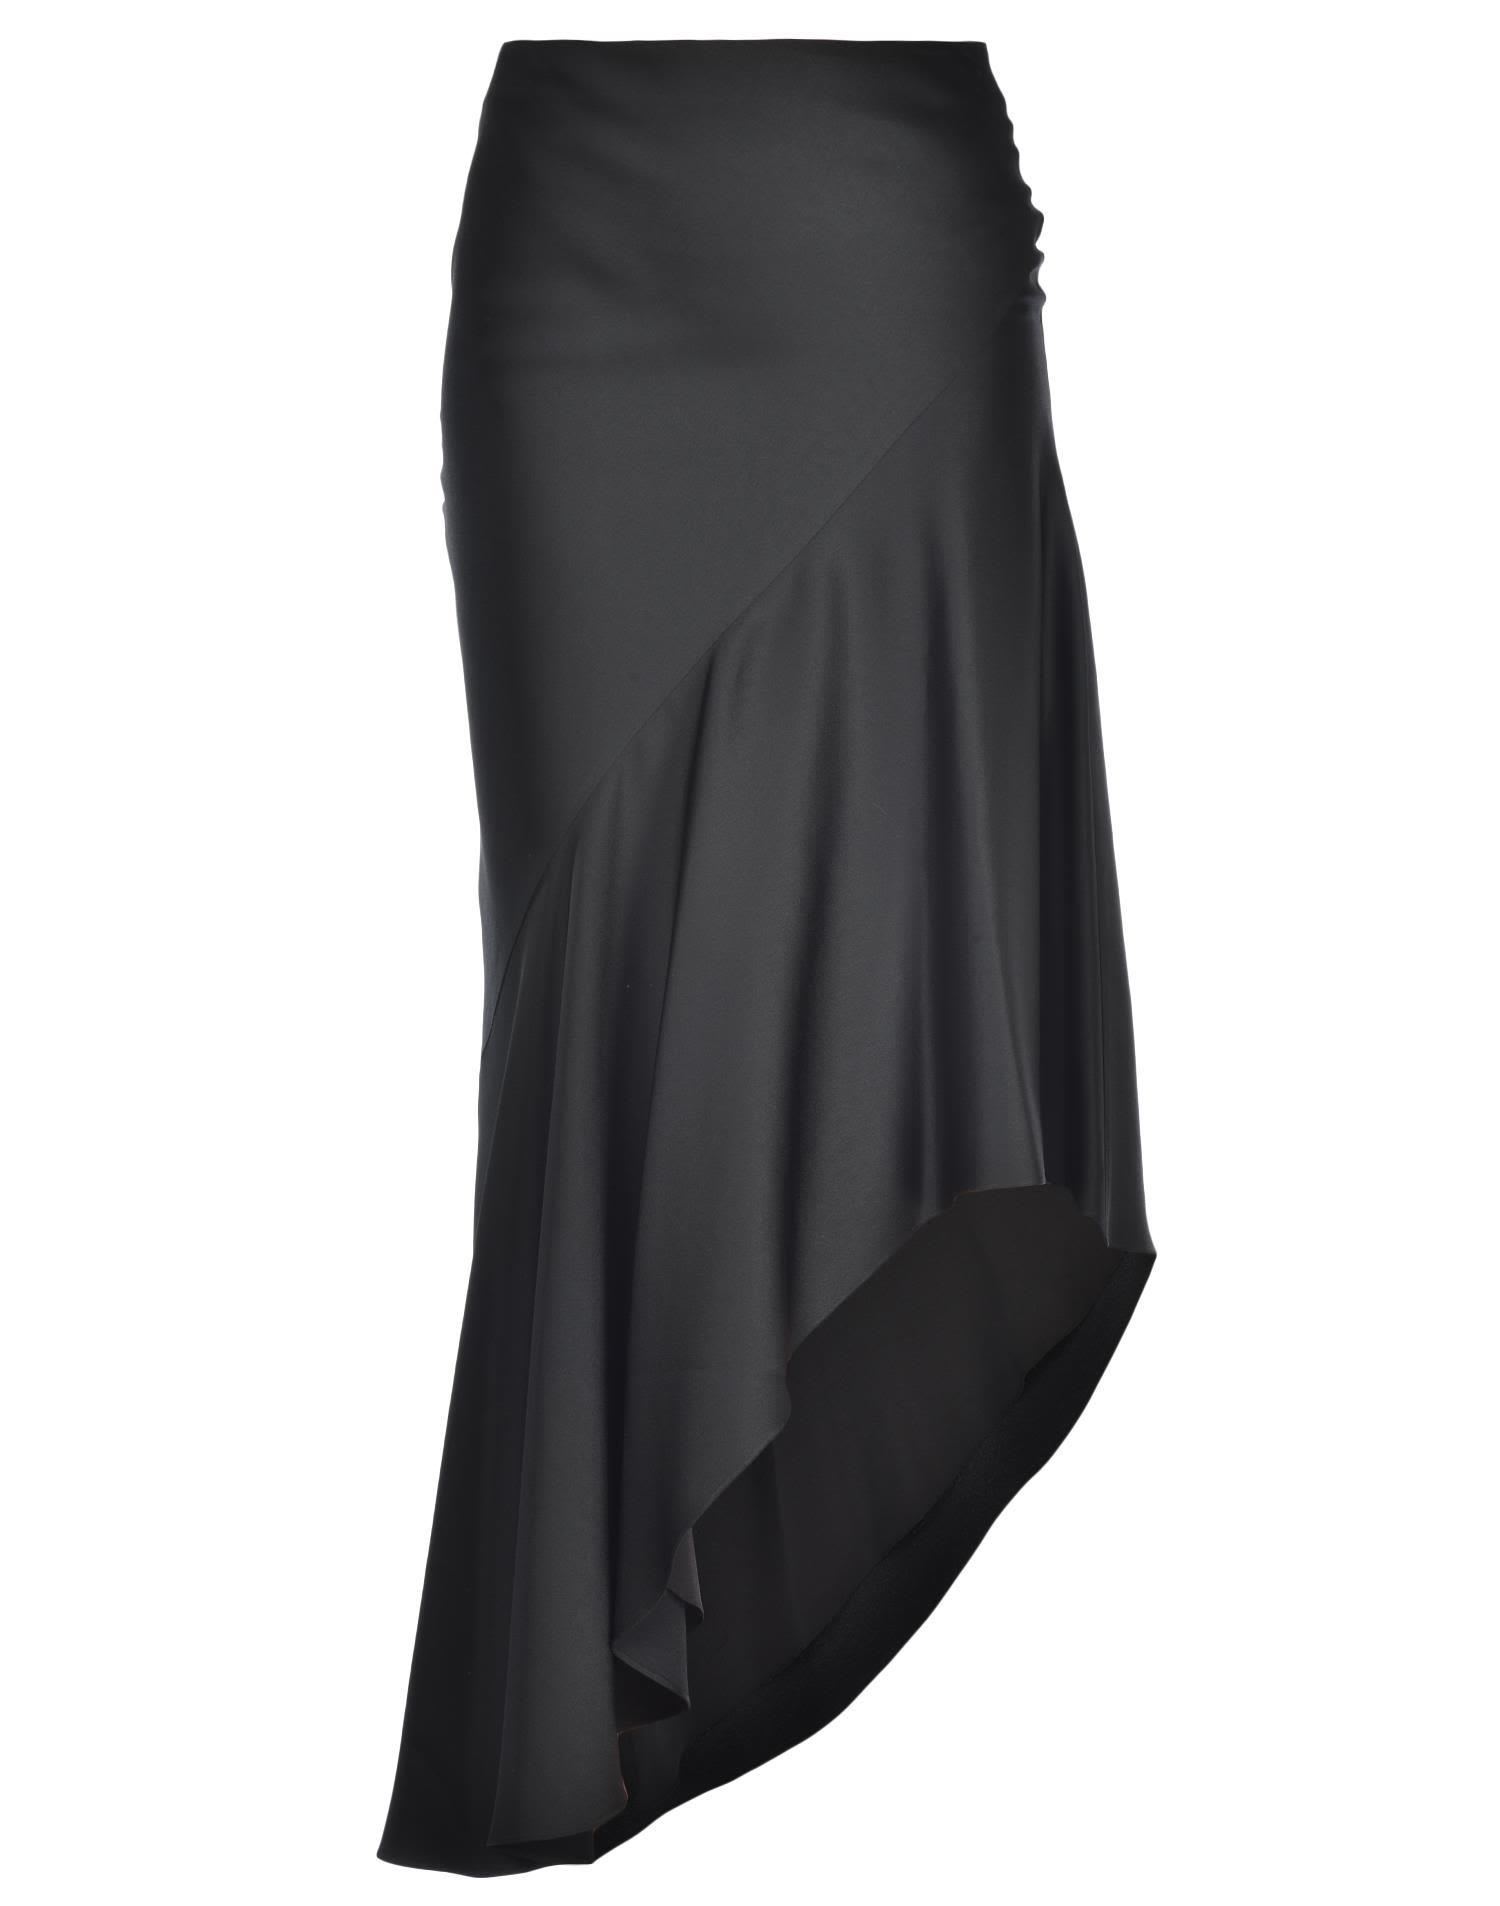 Haider Ackermann Satin Skirt